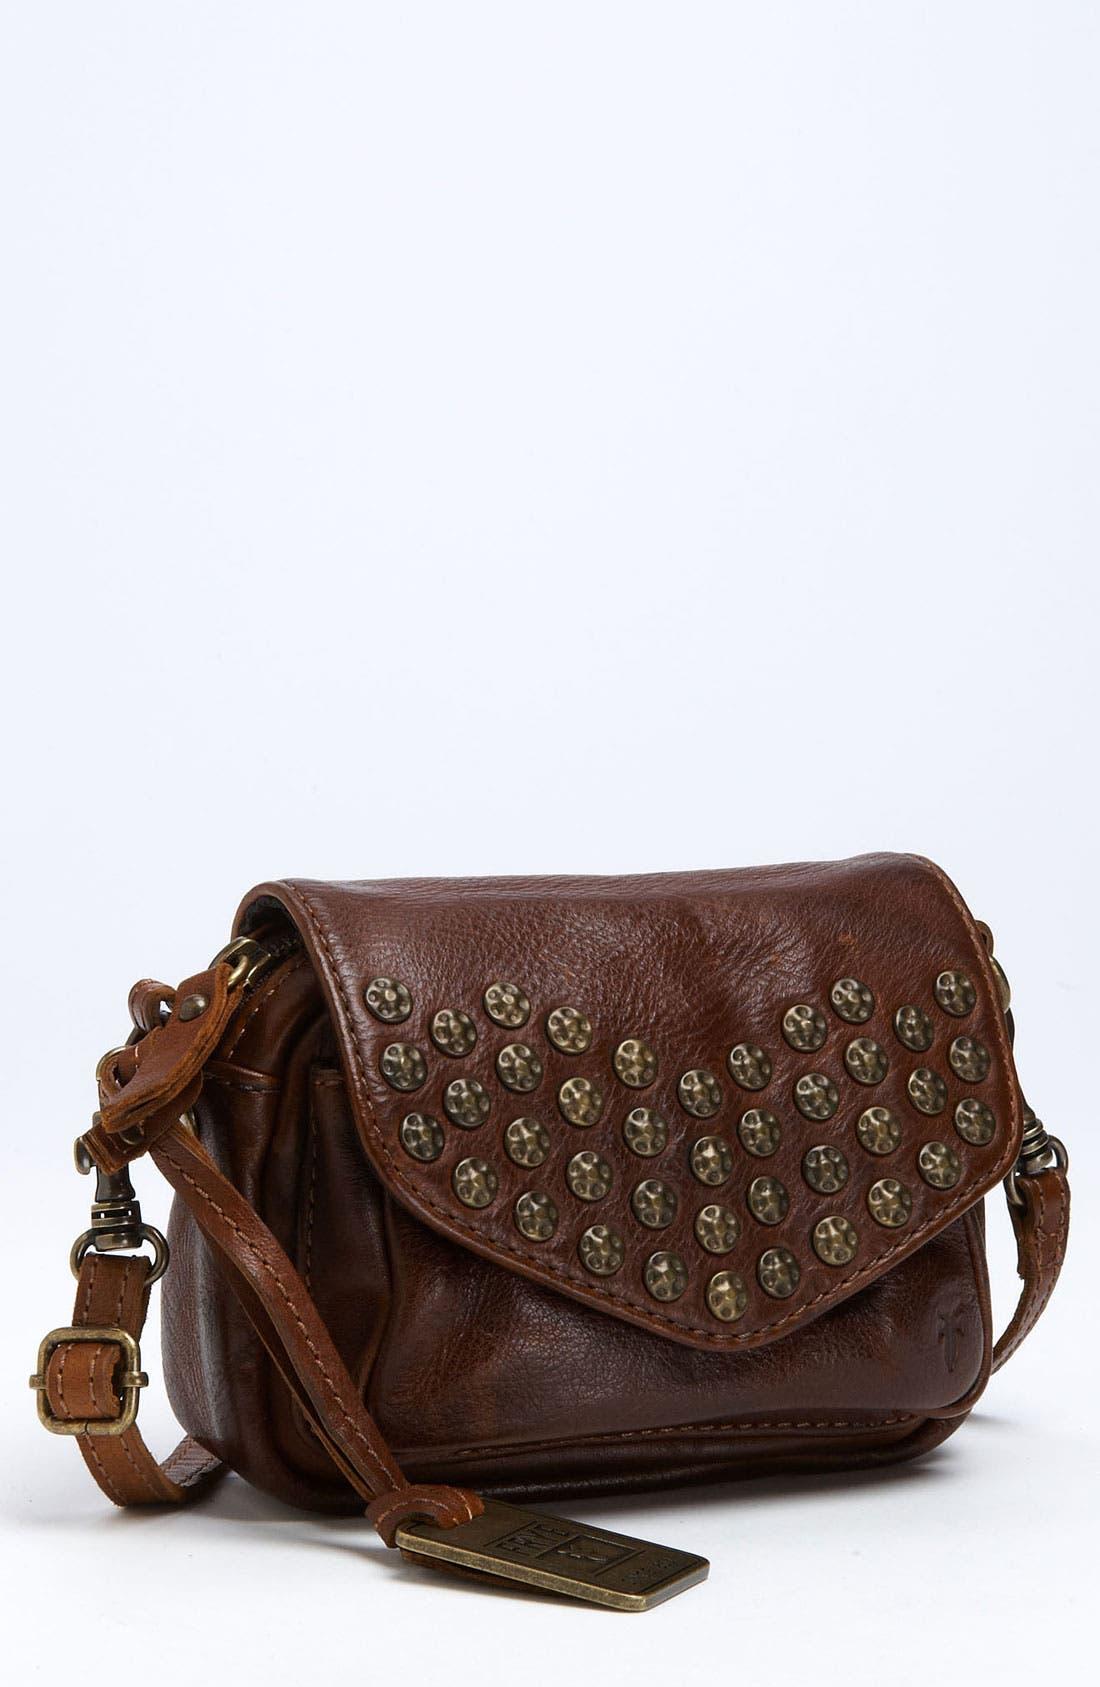 Alternate Image 1 Selected - Frye 'Brooke - Mini' Crossbody Bag